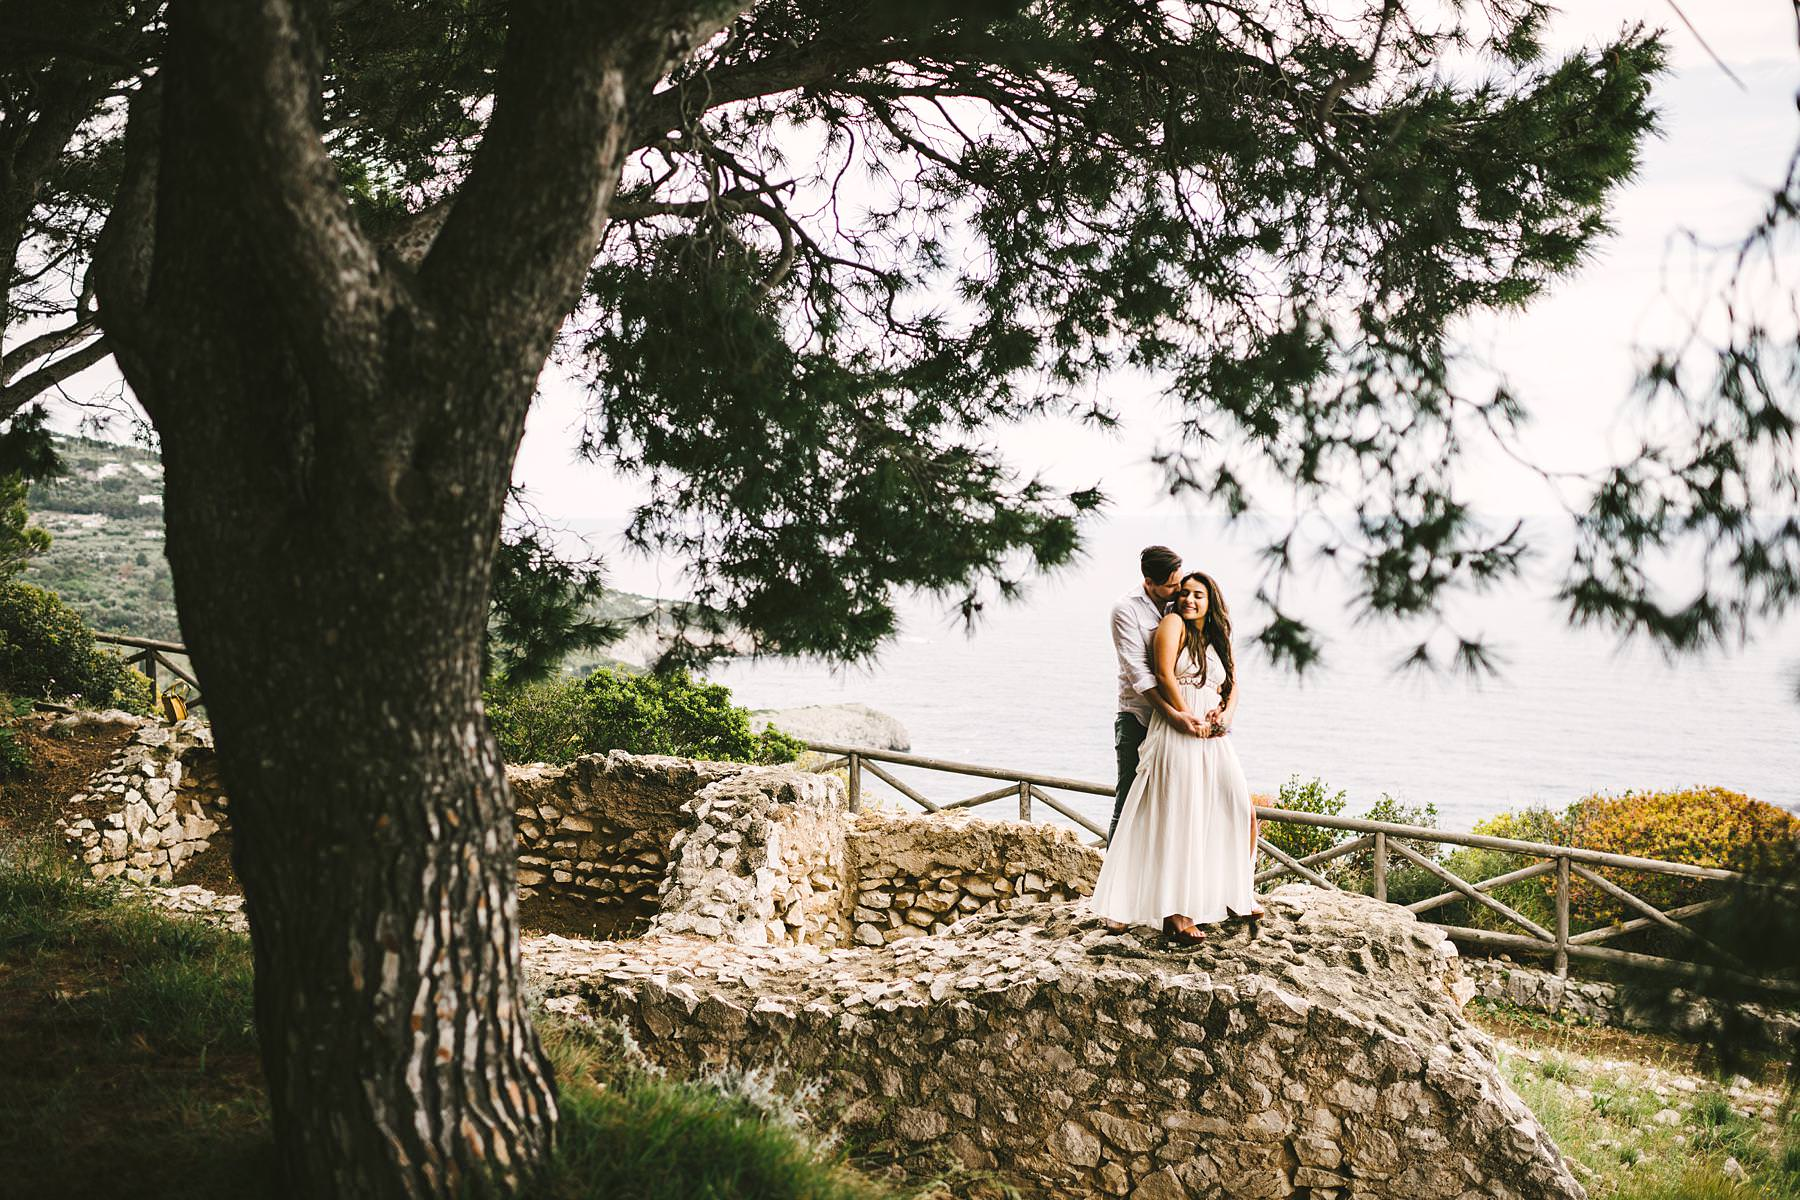 Amazing and romantic couple portrait engagement pre-wedding photo tour in Capri island